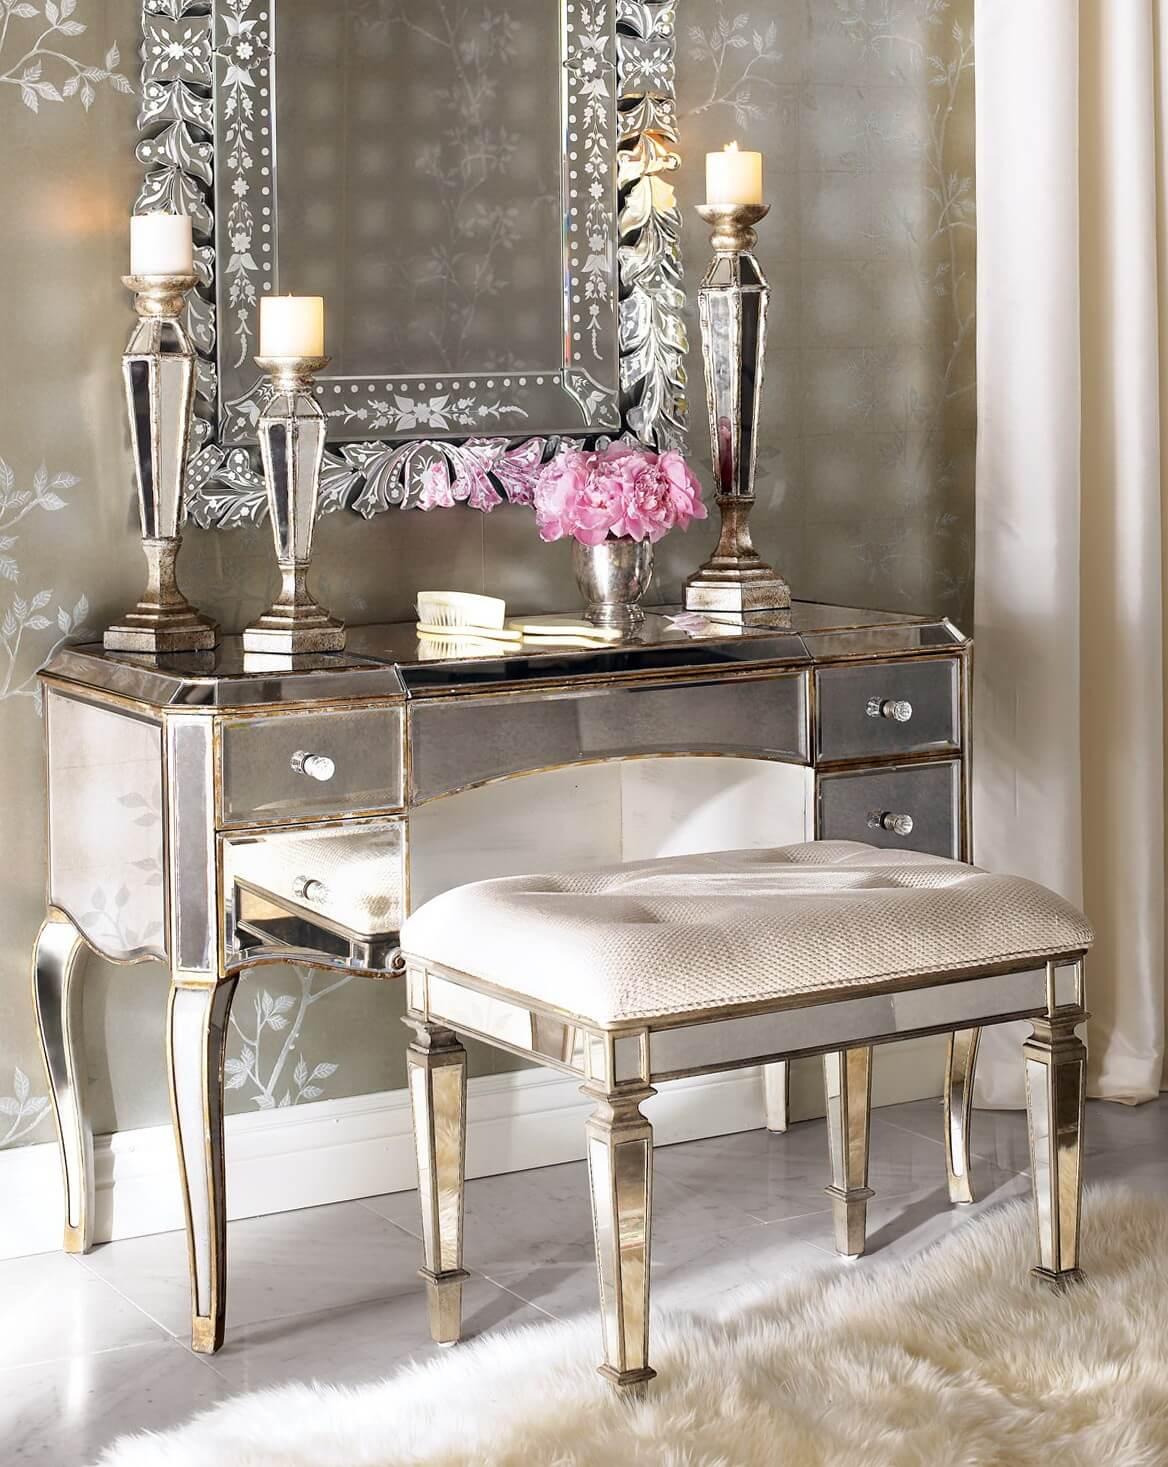 15 Stunning Makeup Vanity Decor Ideas - Style Motivation on Makeup Room Ideas  id=23582